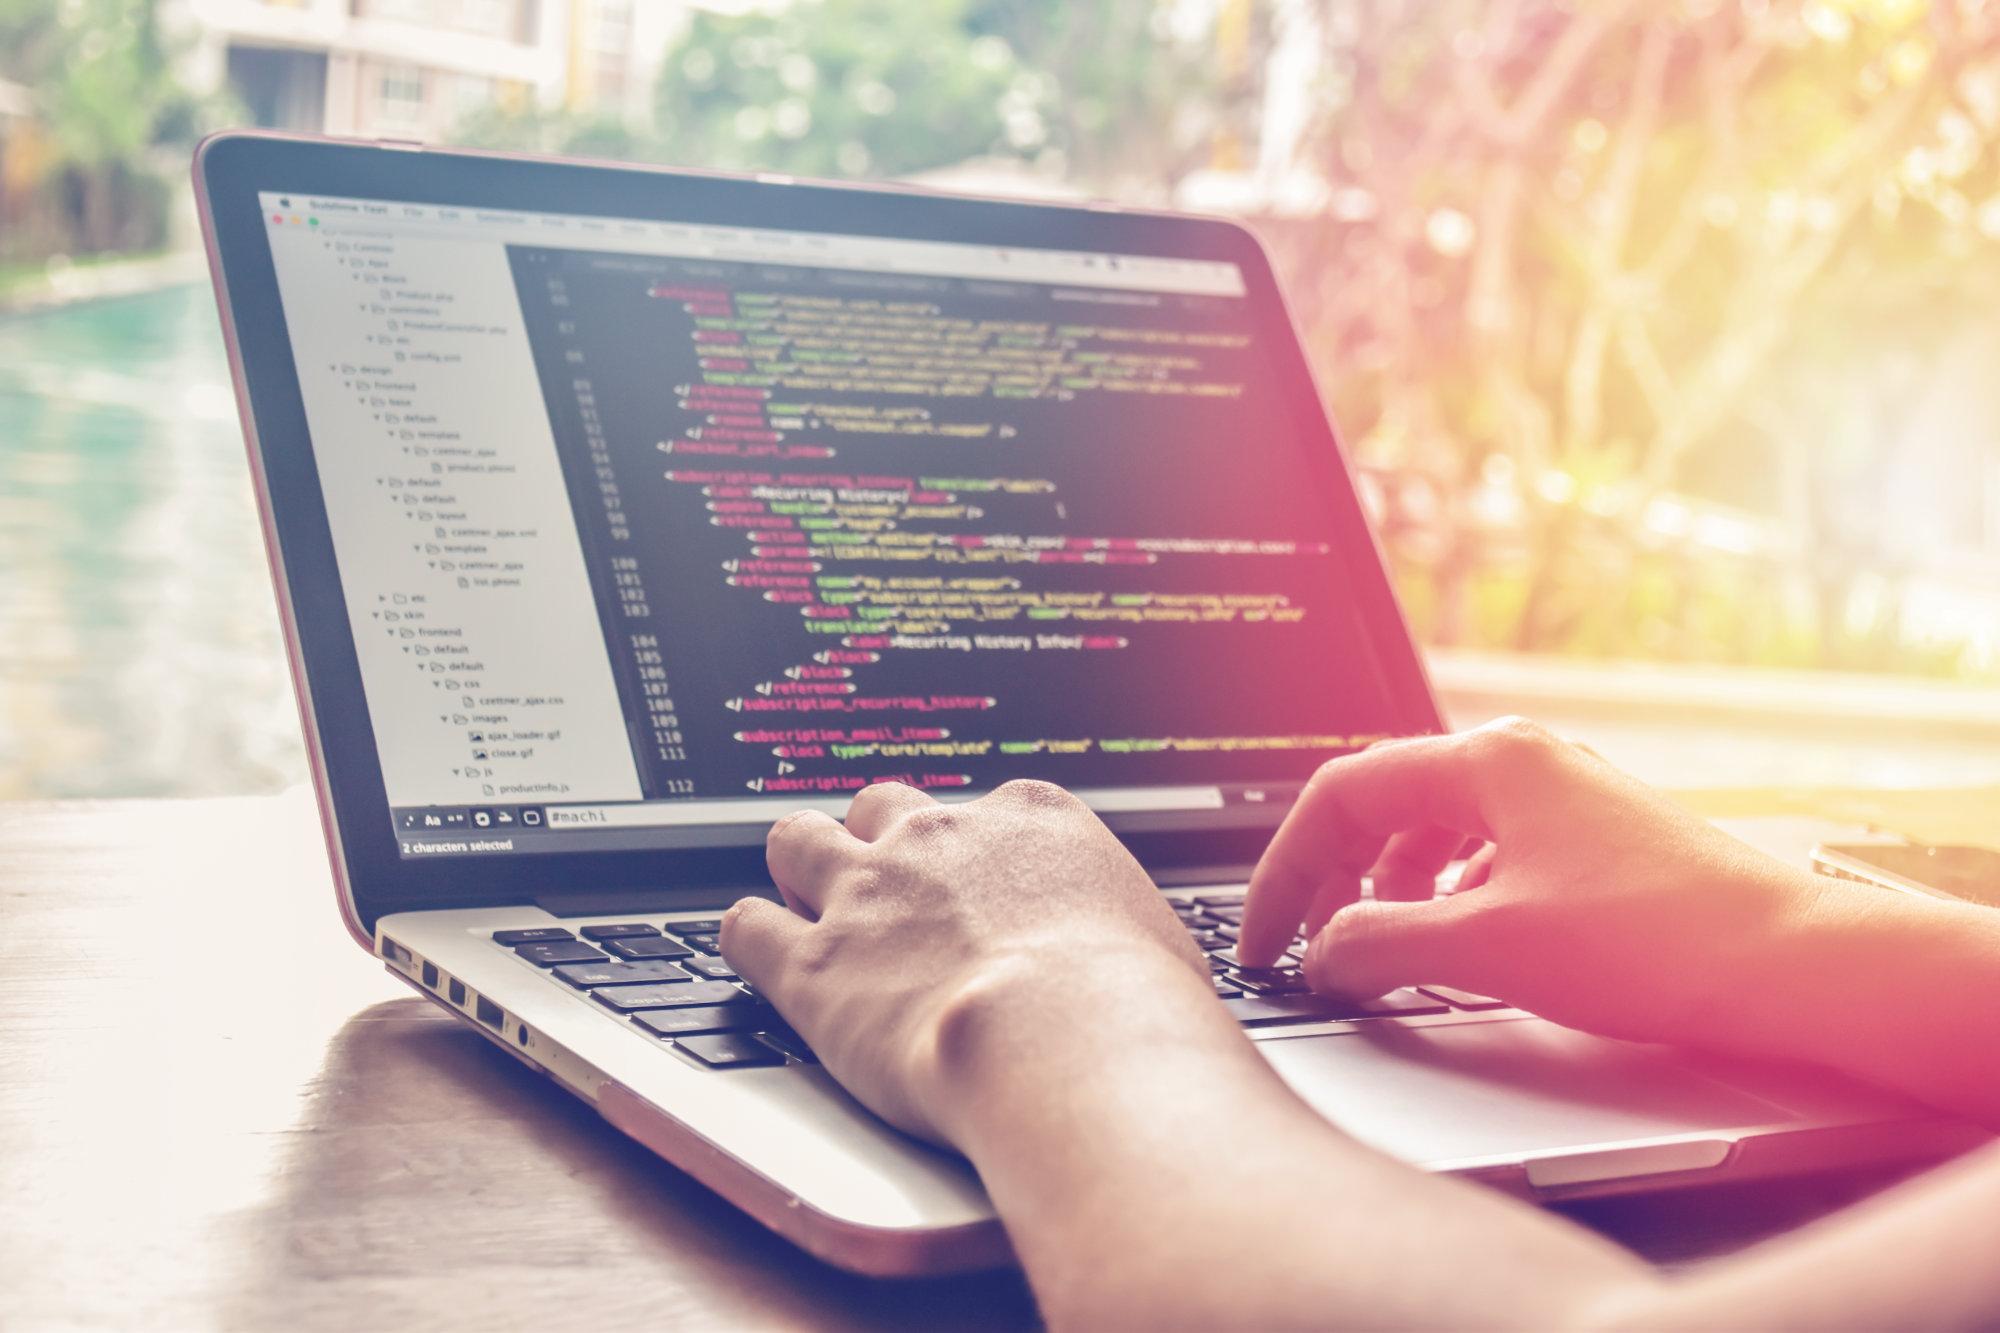 Programmer on laptop